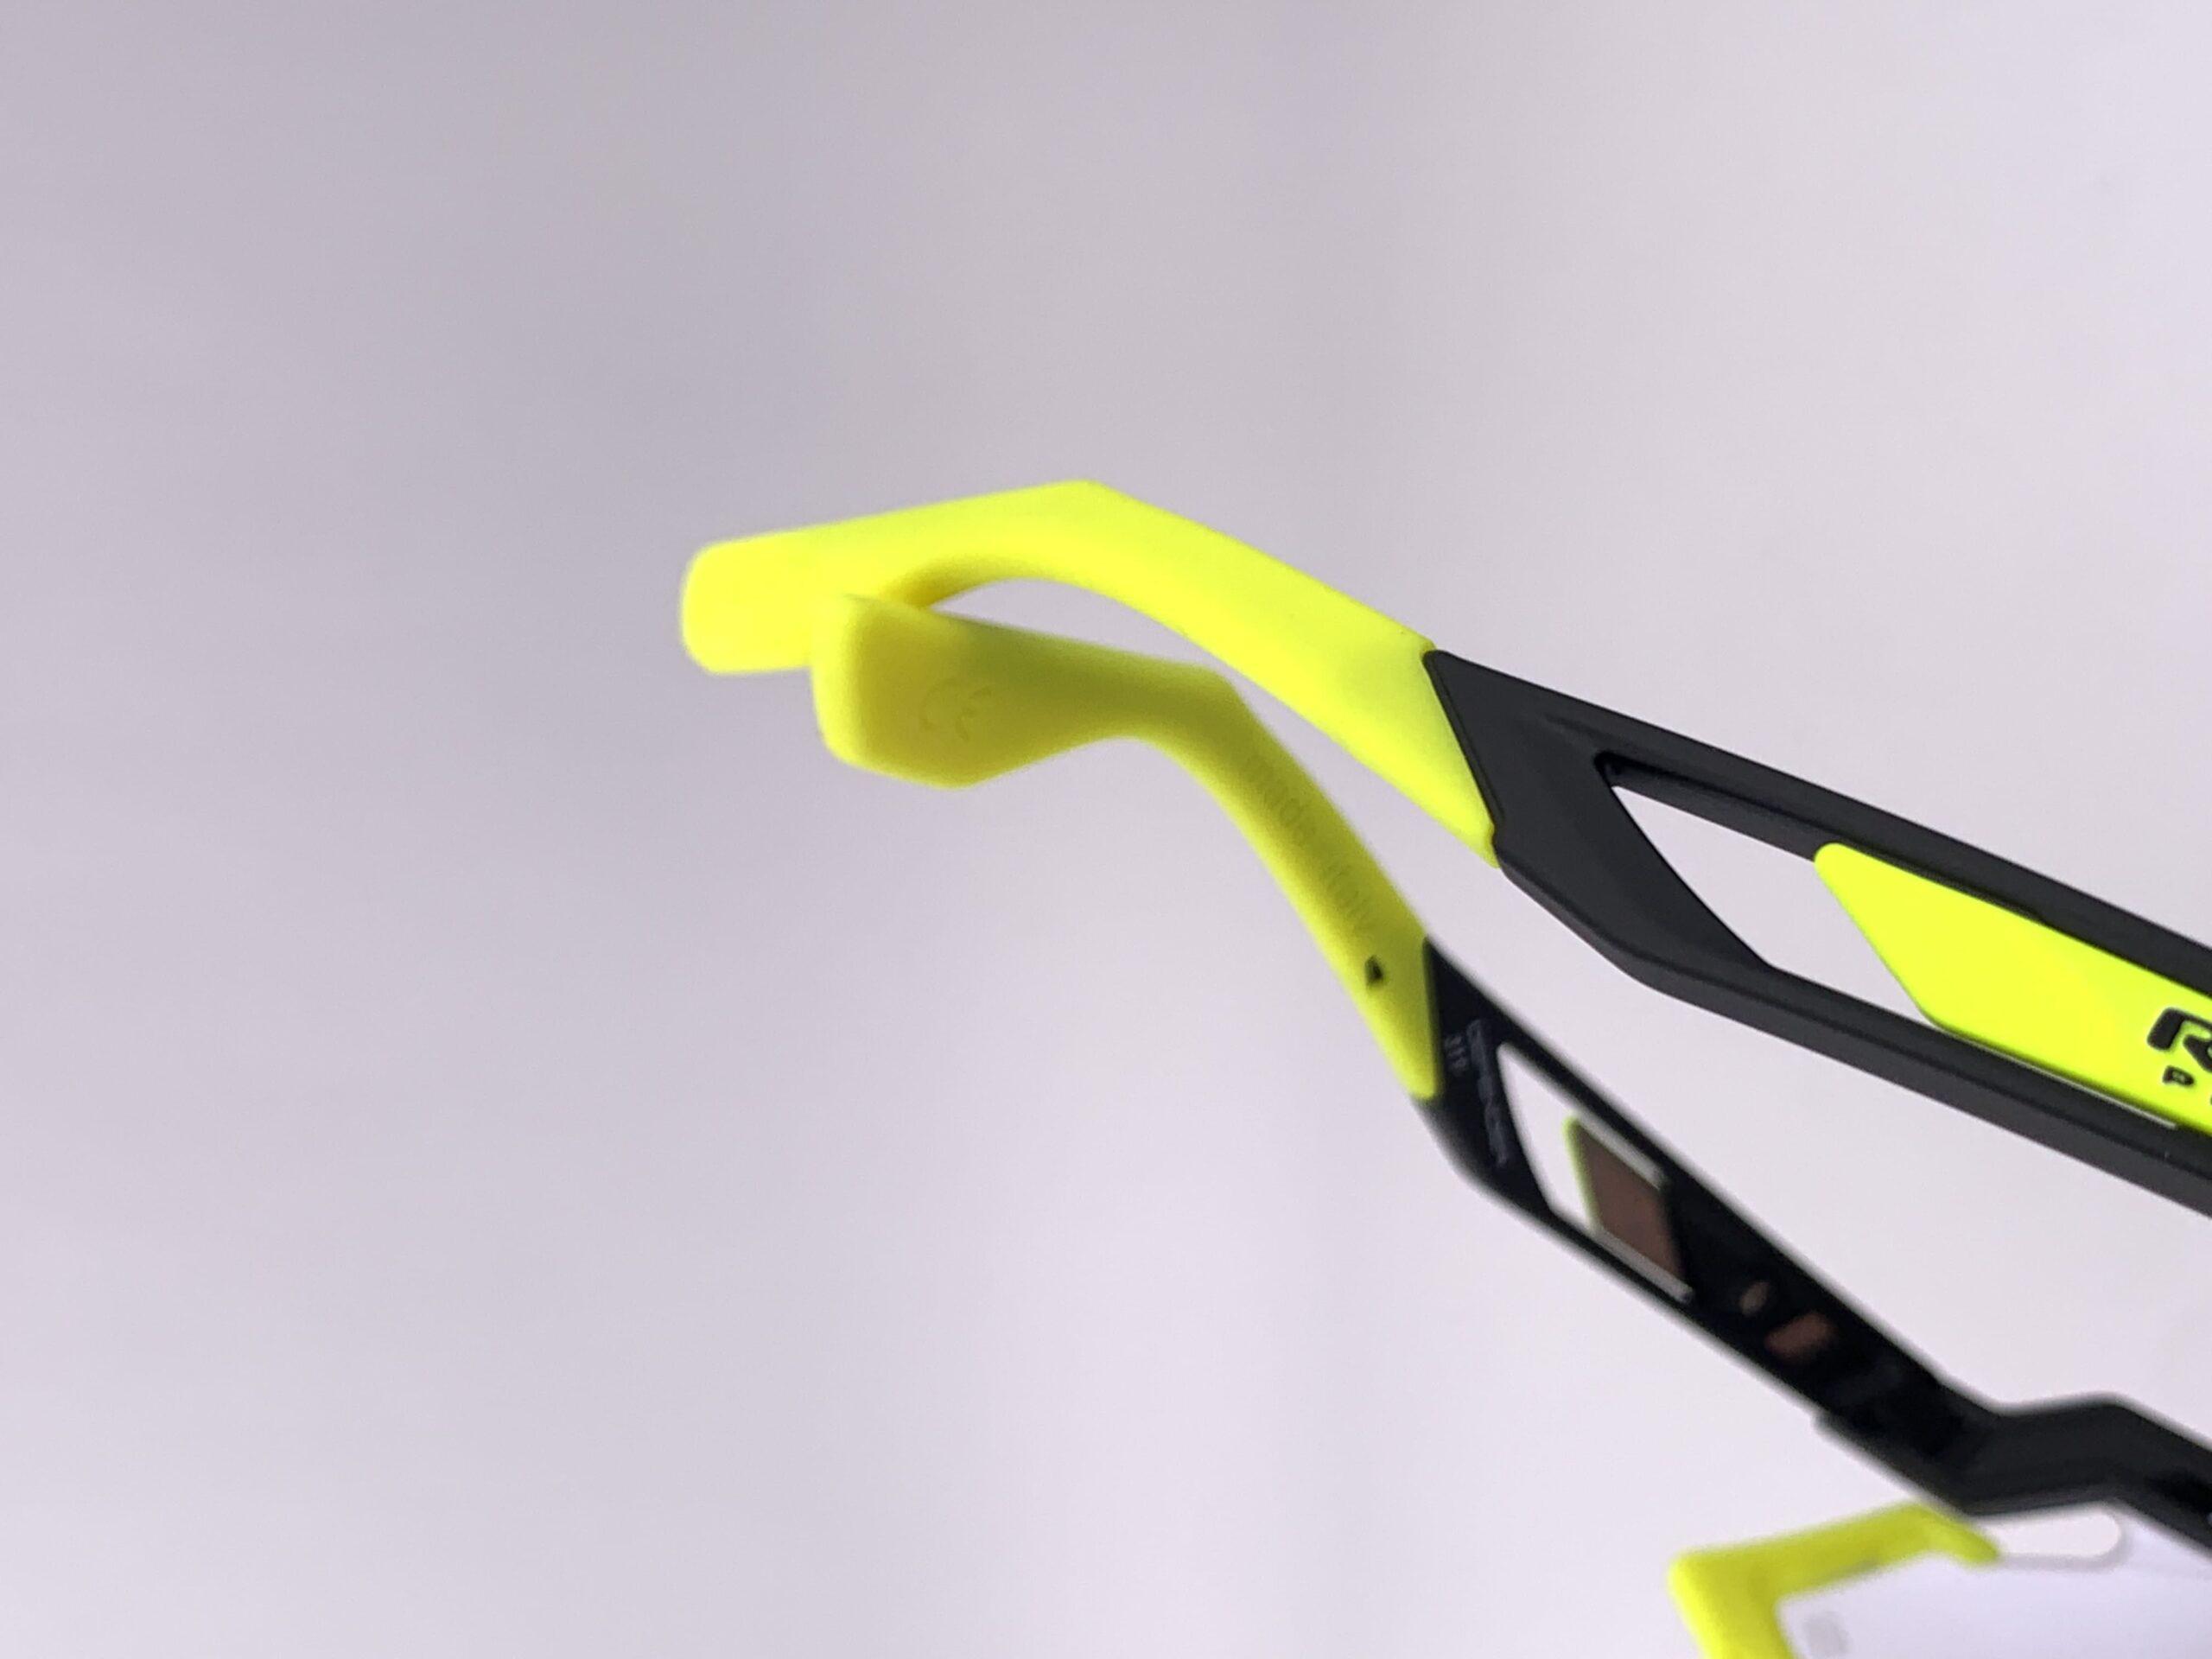 Cyklistické okuliare Defender žlté fluo bočnice